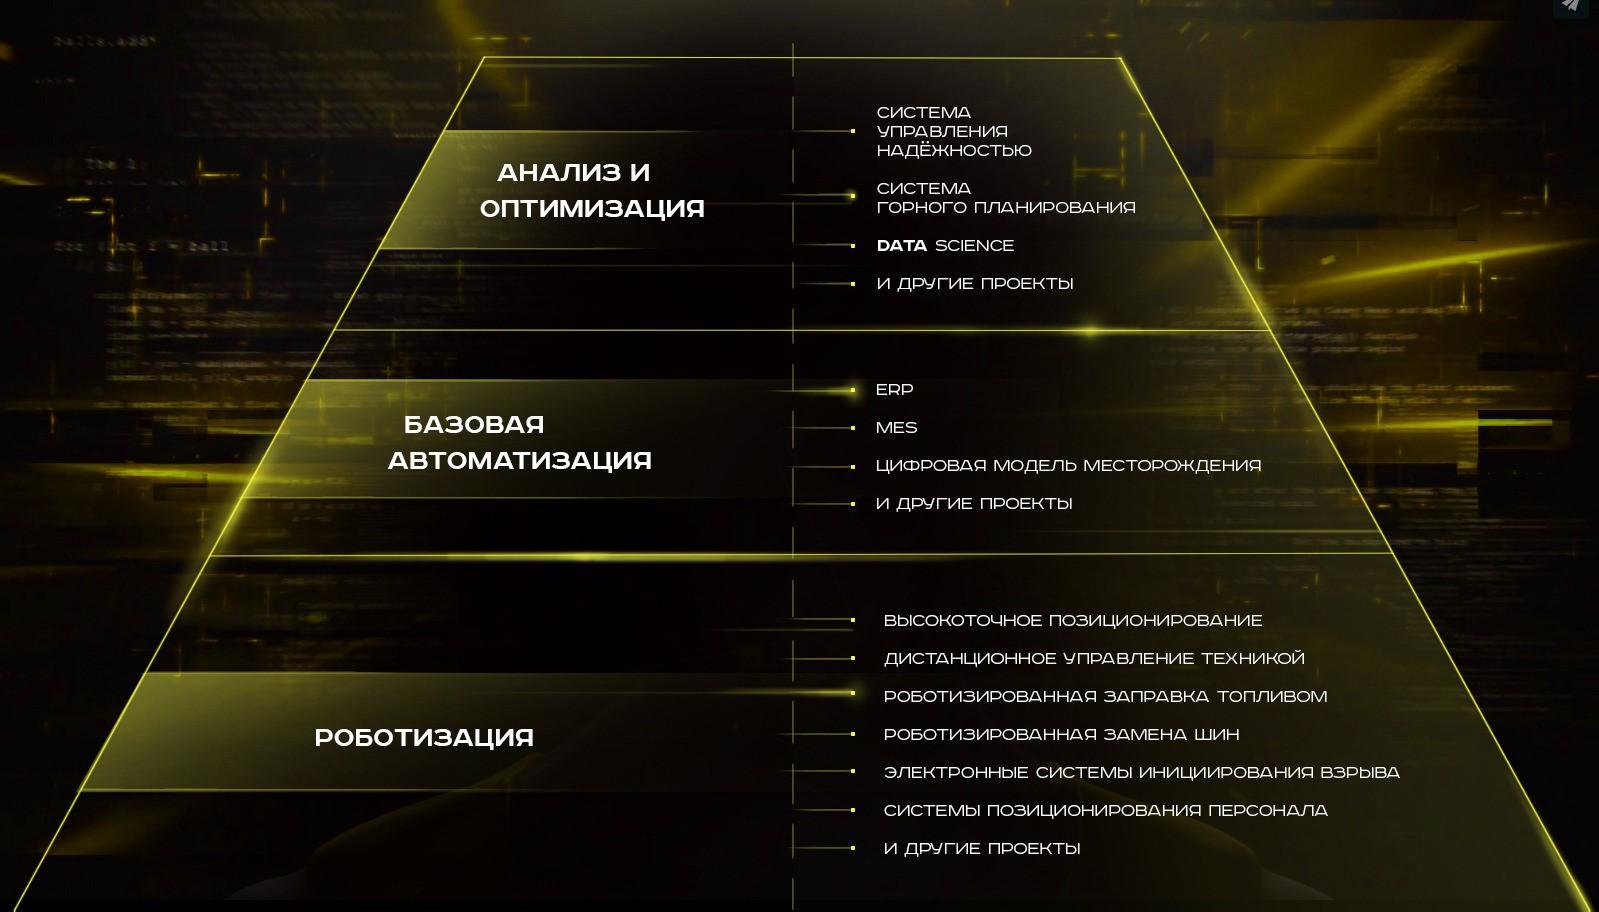 Пирамида цифровой трансформации «Полюса»